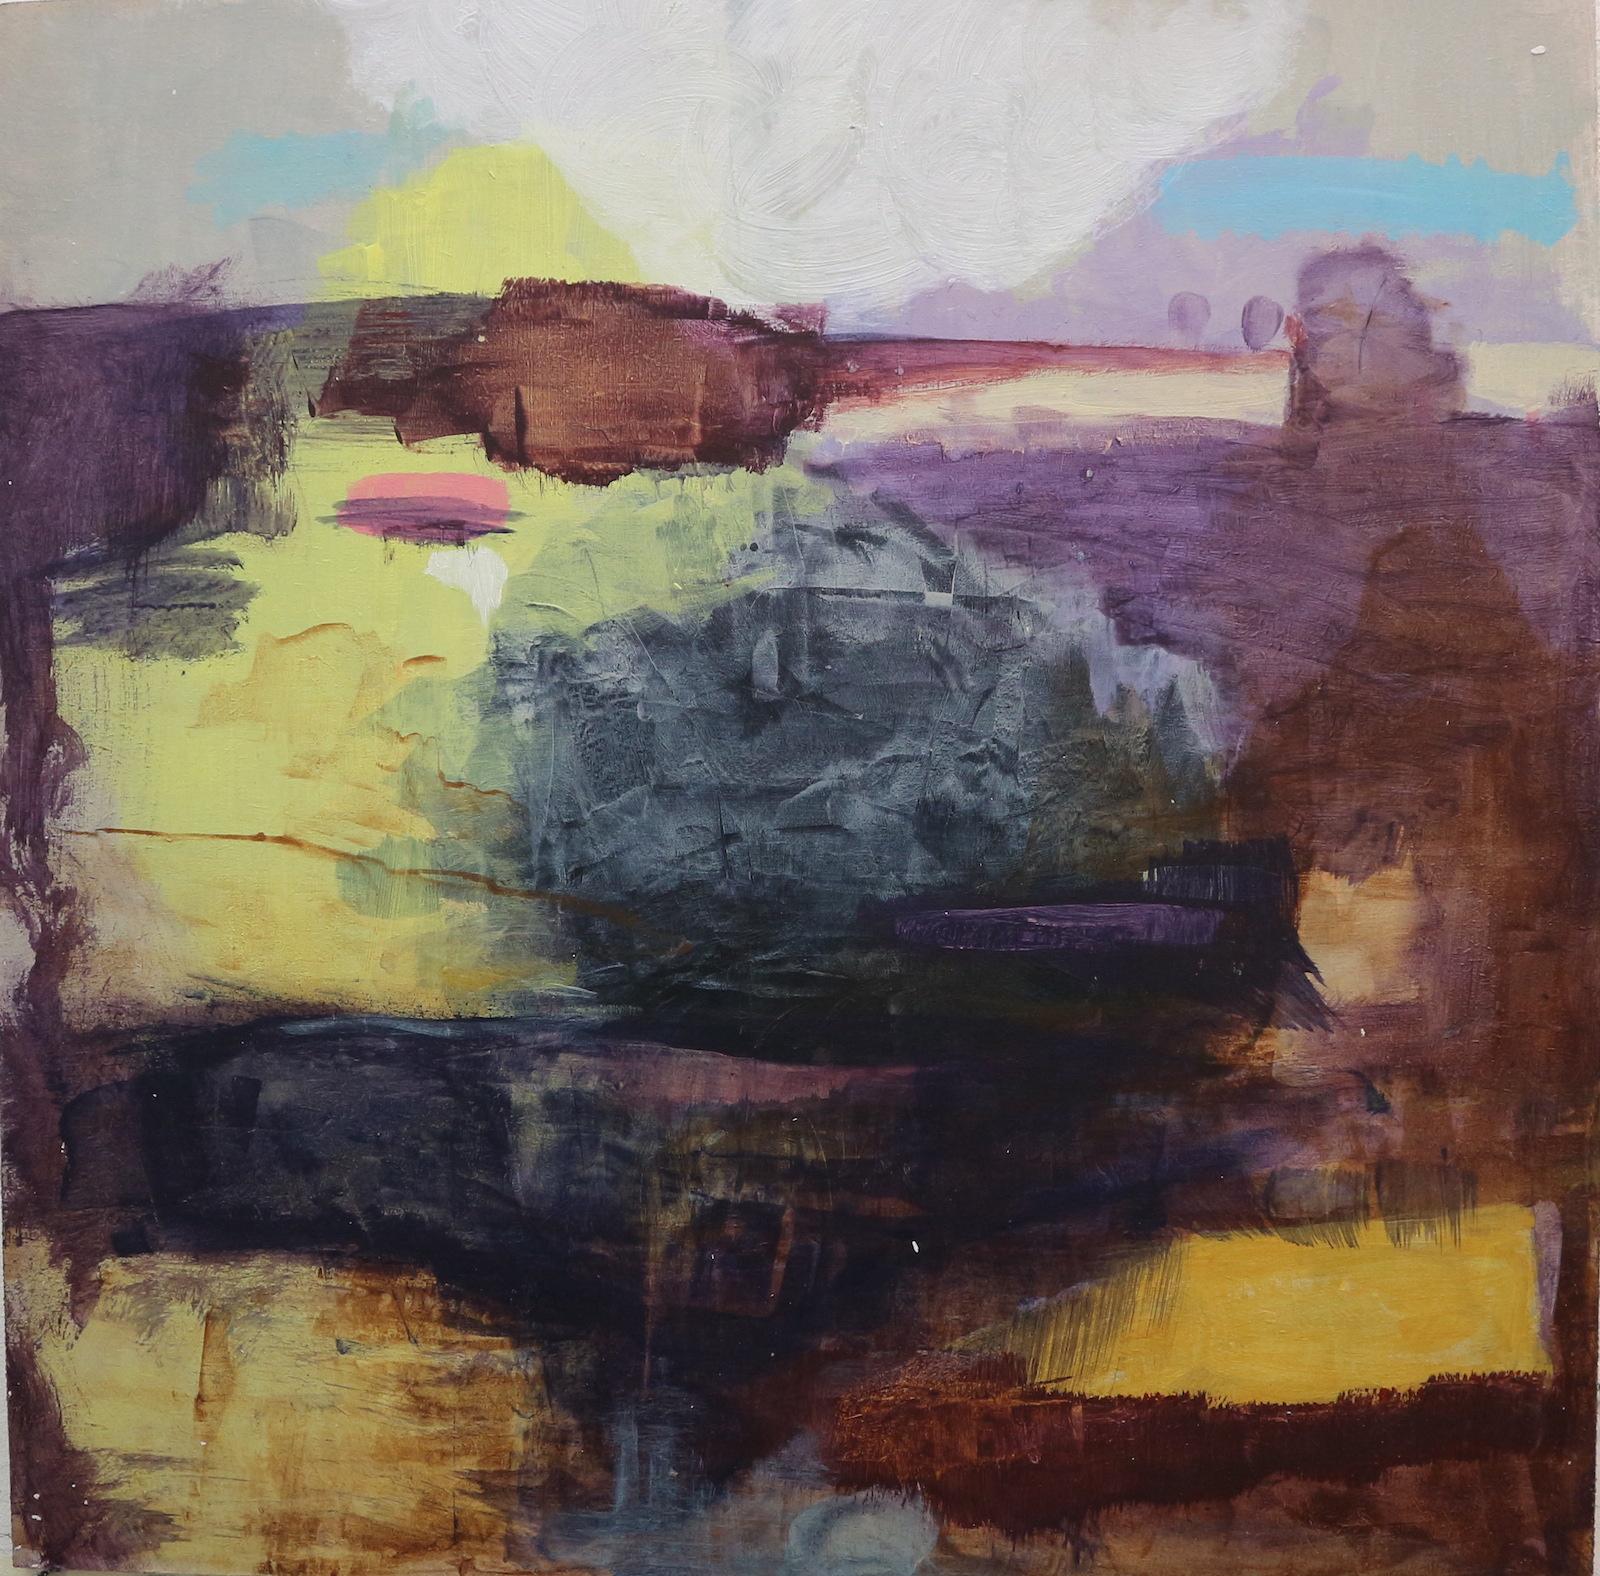 purple-yellow landscape, 40 cm x 40 cm, acrylic on mdf, 2016, Jane Hughes